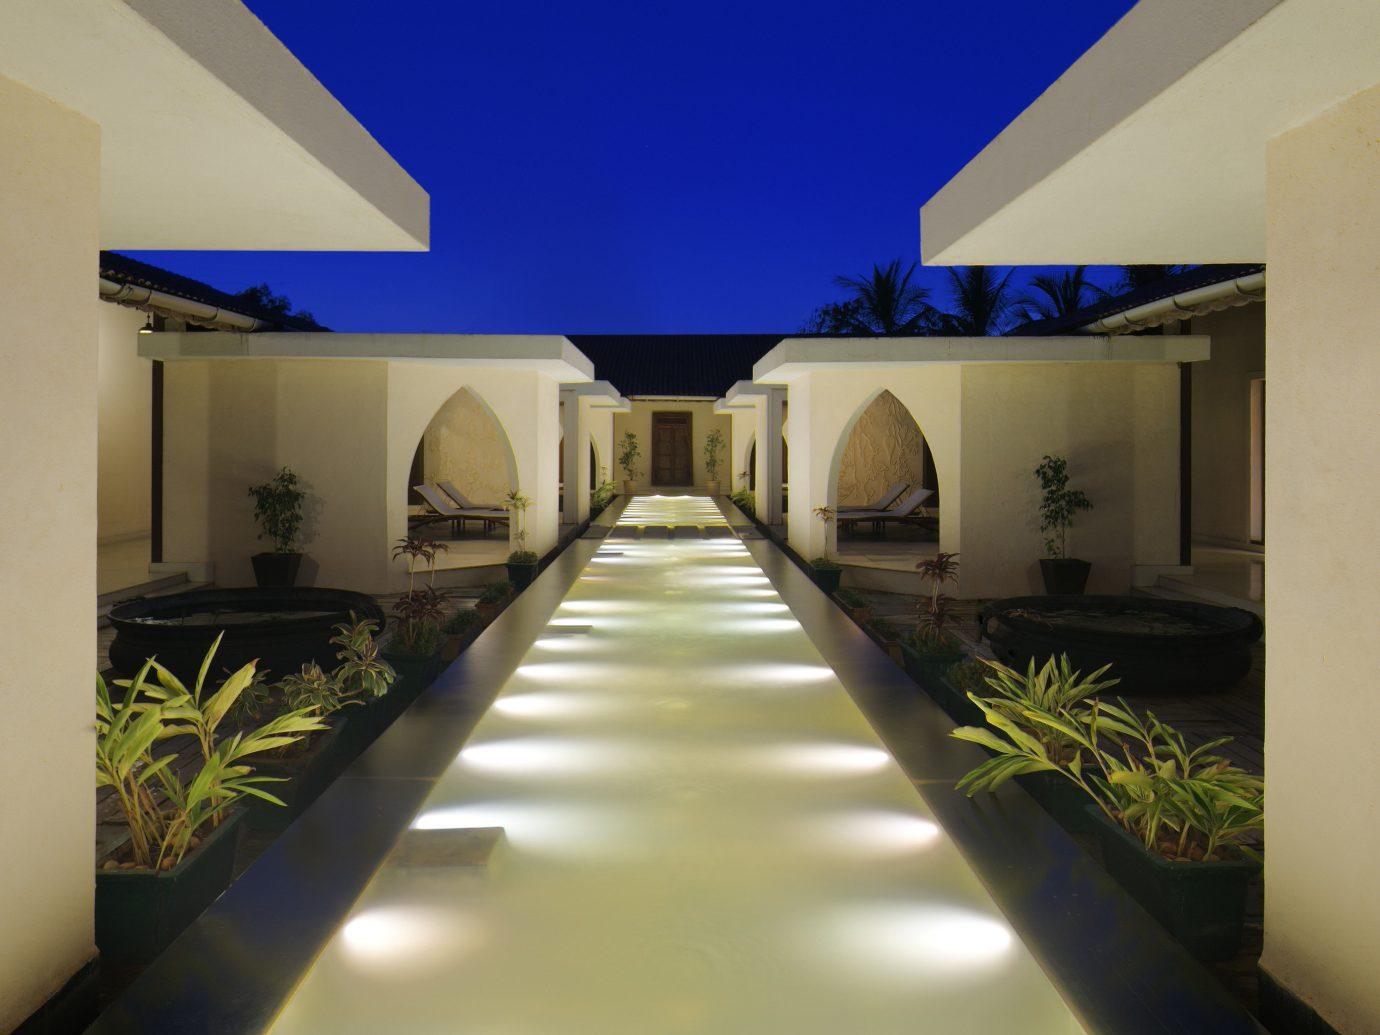 Hotels Luxury Travel property Architecture estate interior design real estate hacienda daylighting house apartment hotel ceiling condominium window